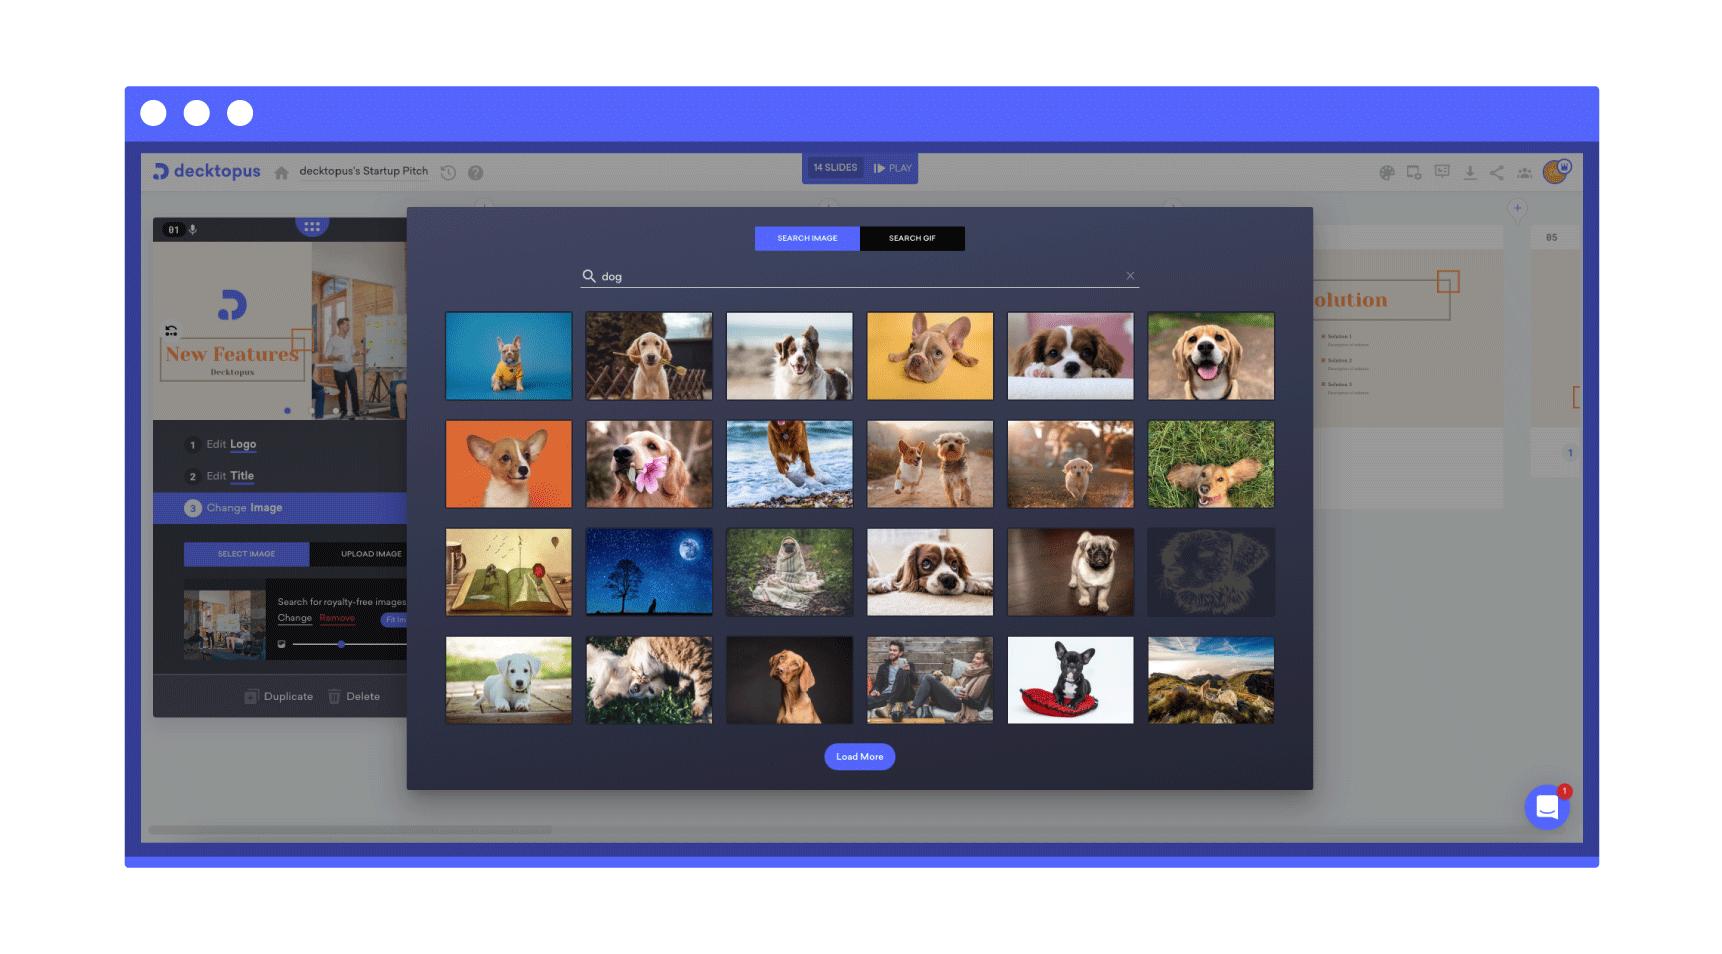 unsplash and pixabay image library of decktopus